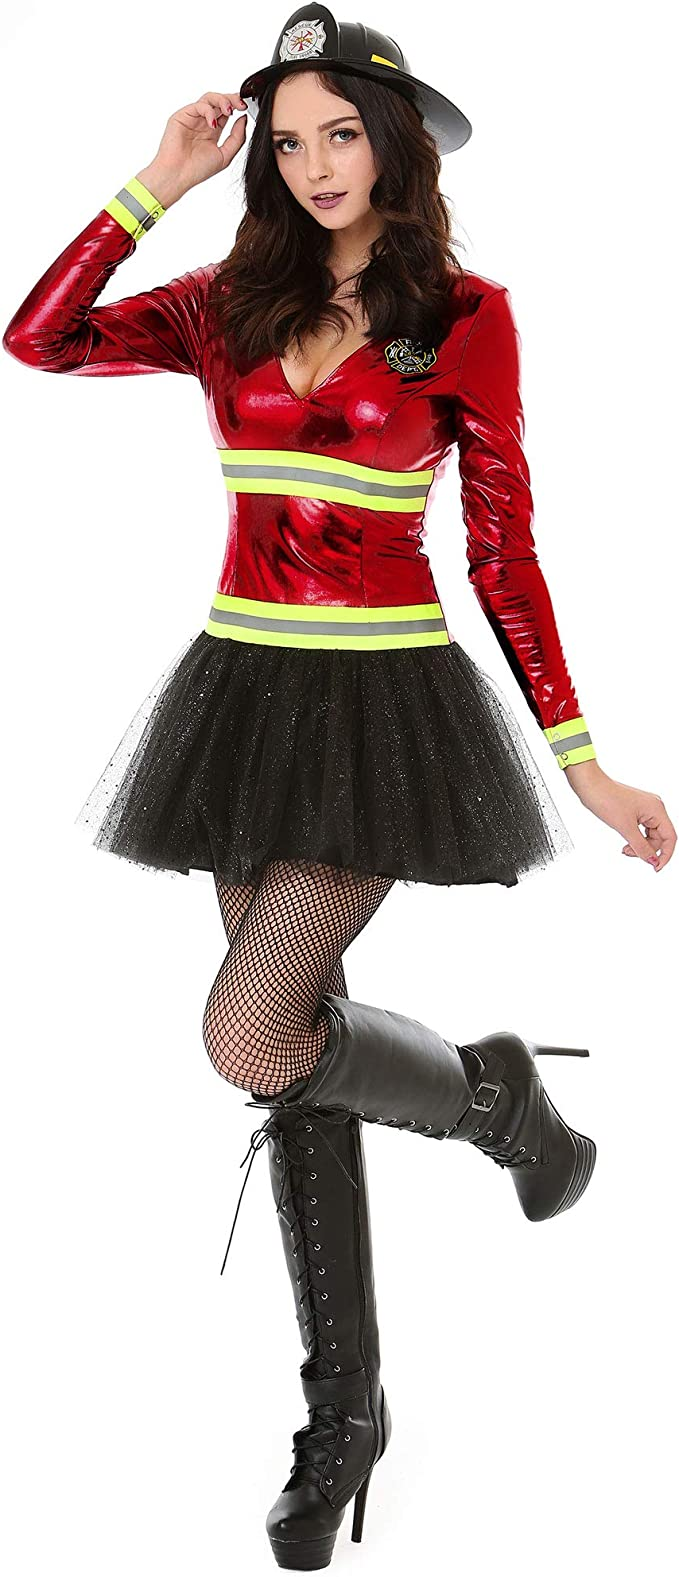 Amazon.com: ¡Boo! Inc. Disfraz de bombero para mujer ...